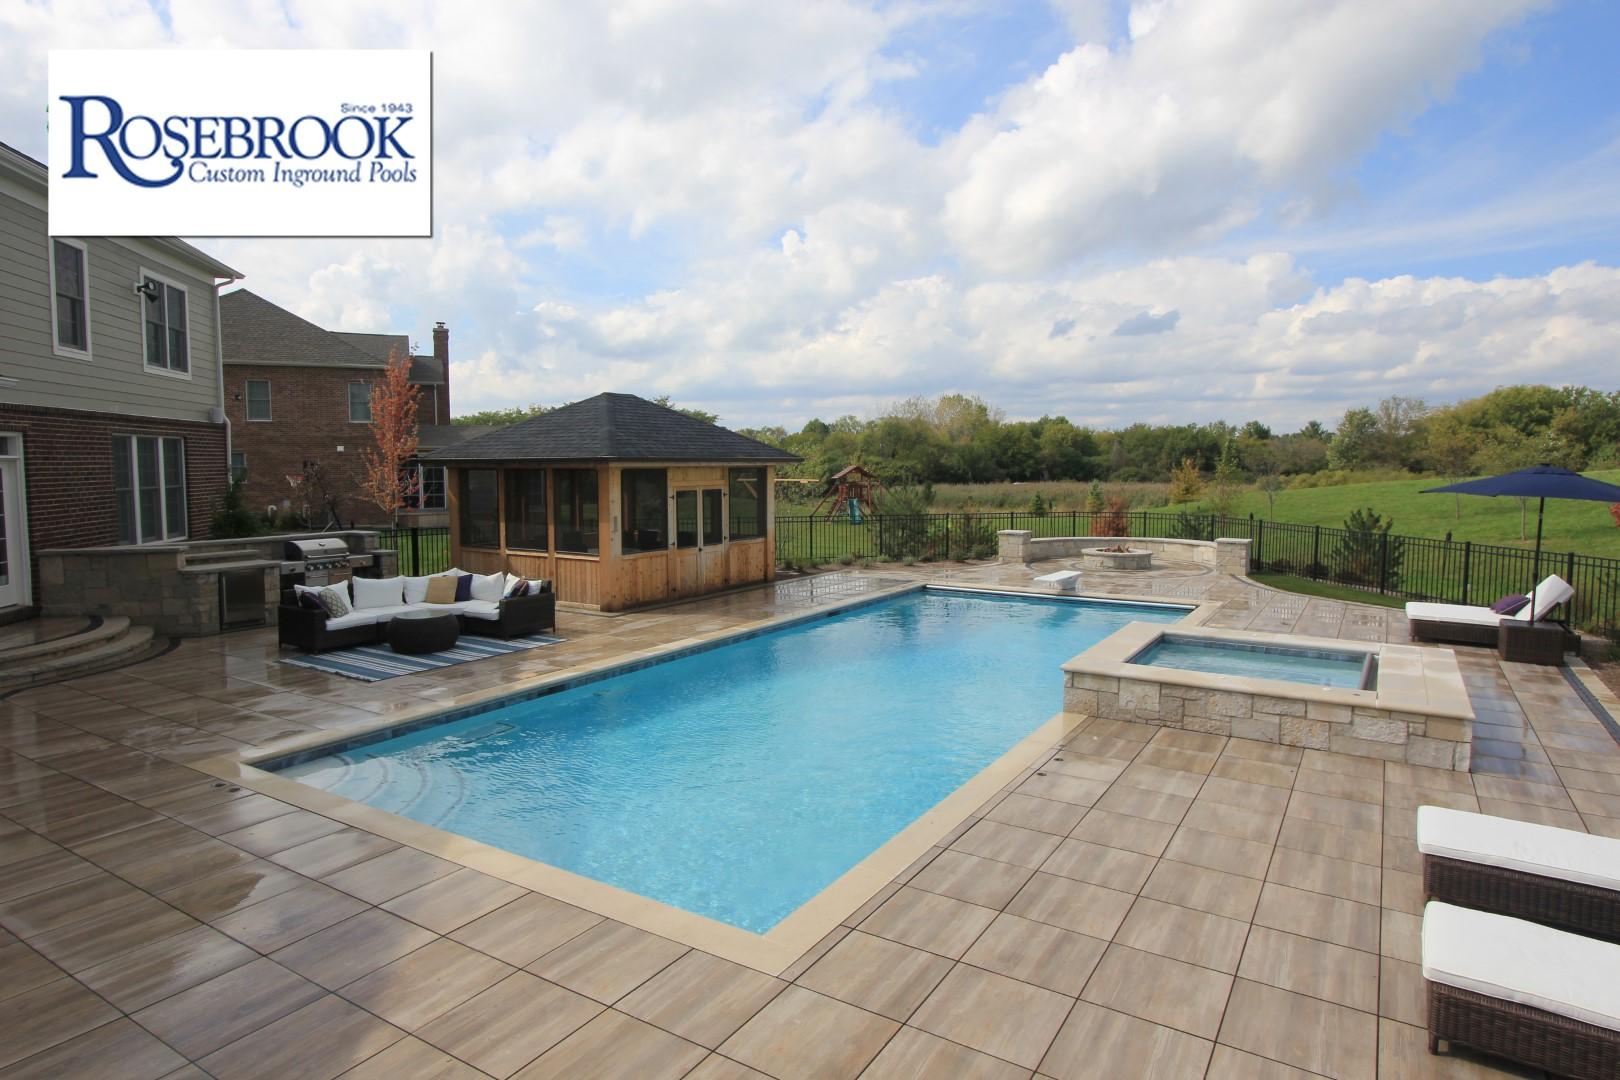 Rosebrook Pools